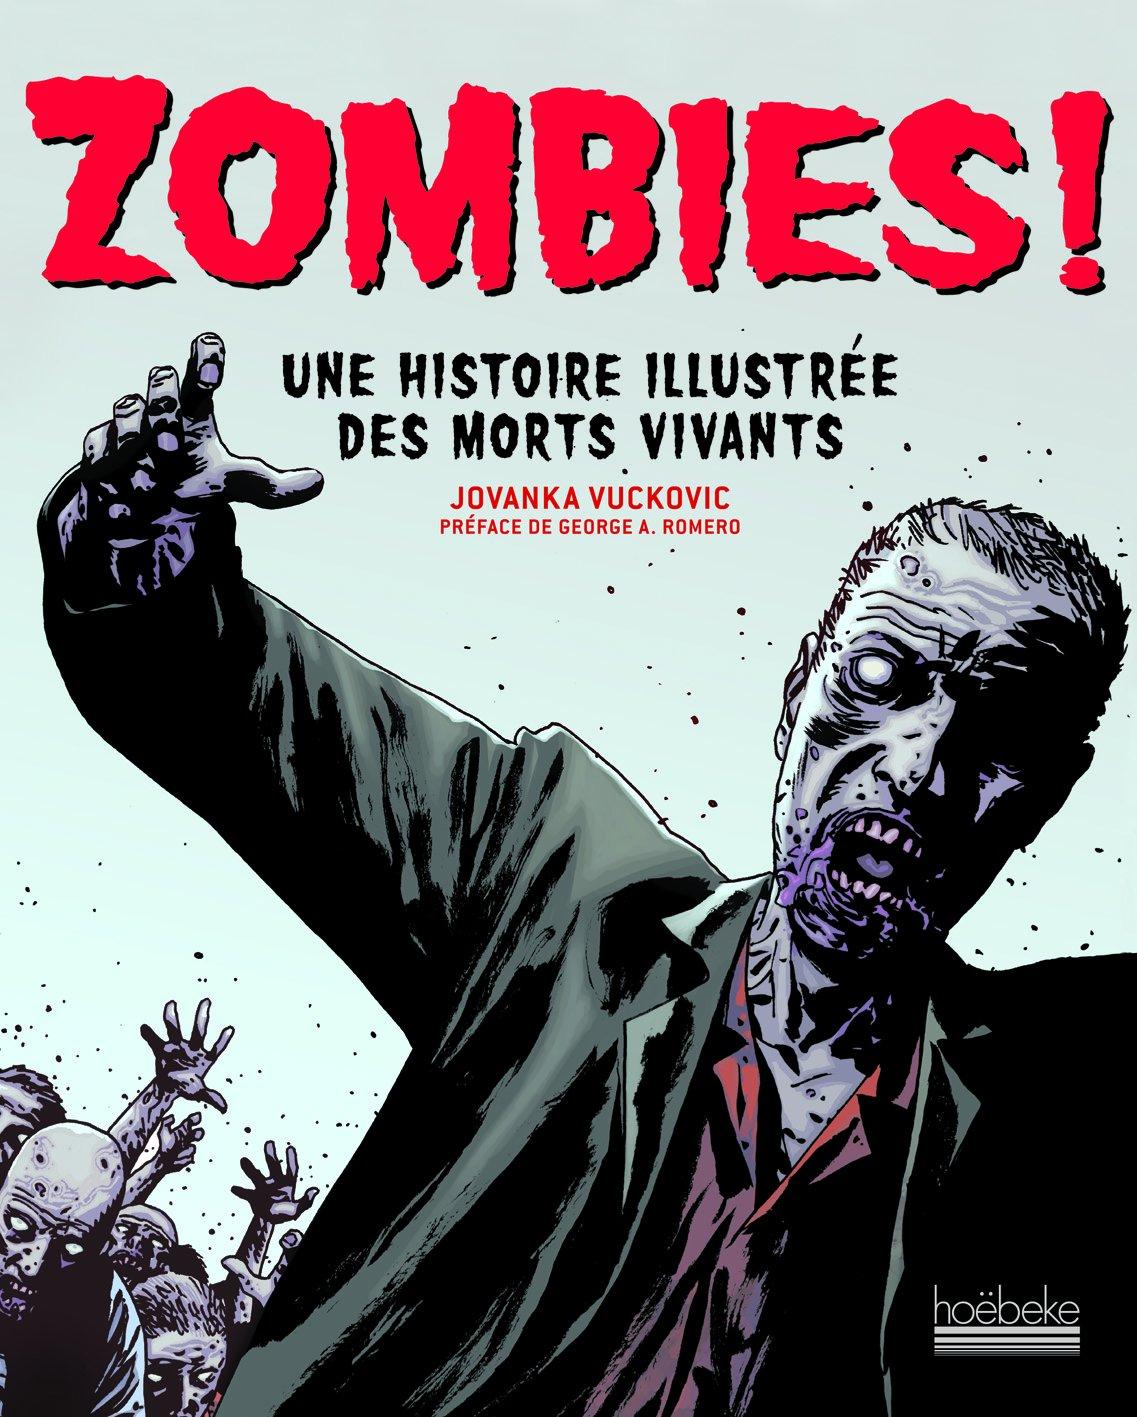 Zombies!: Une histoire illustrée des morts vivants por Jovanka Vuckovic